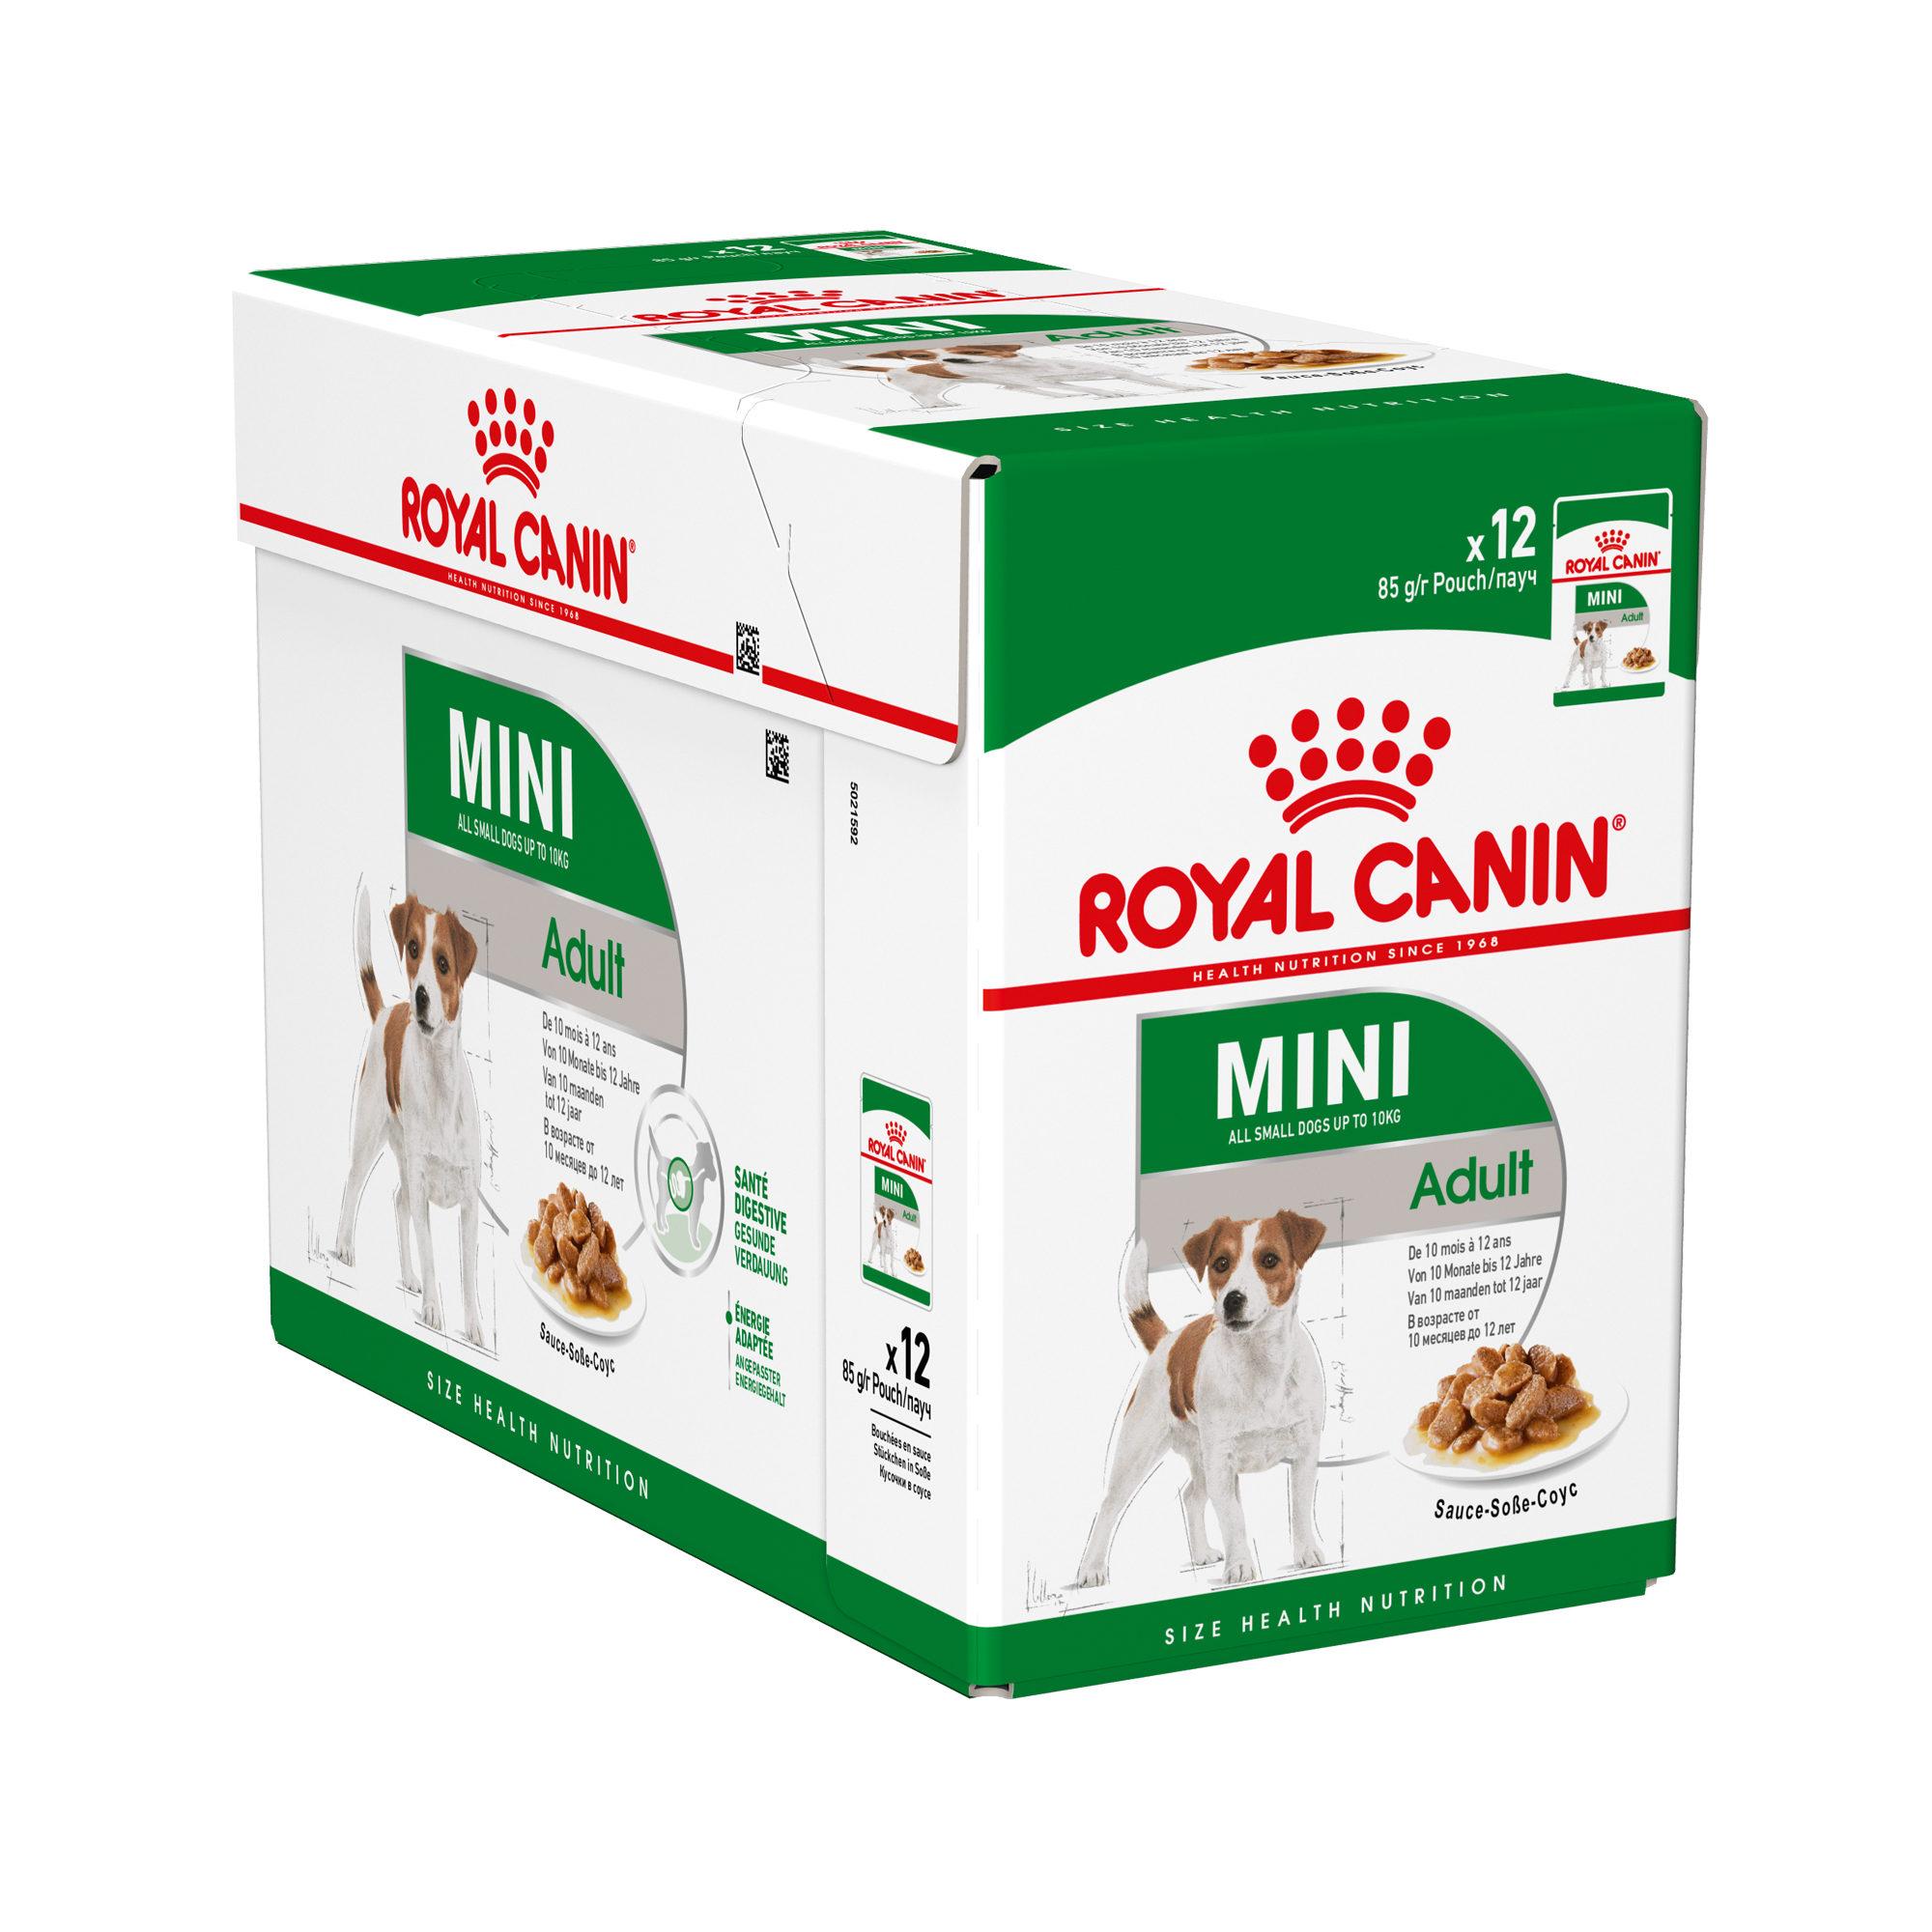 Royal Canin Mini Adult Hundefutter - Frischebeutel